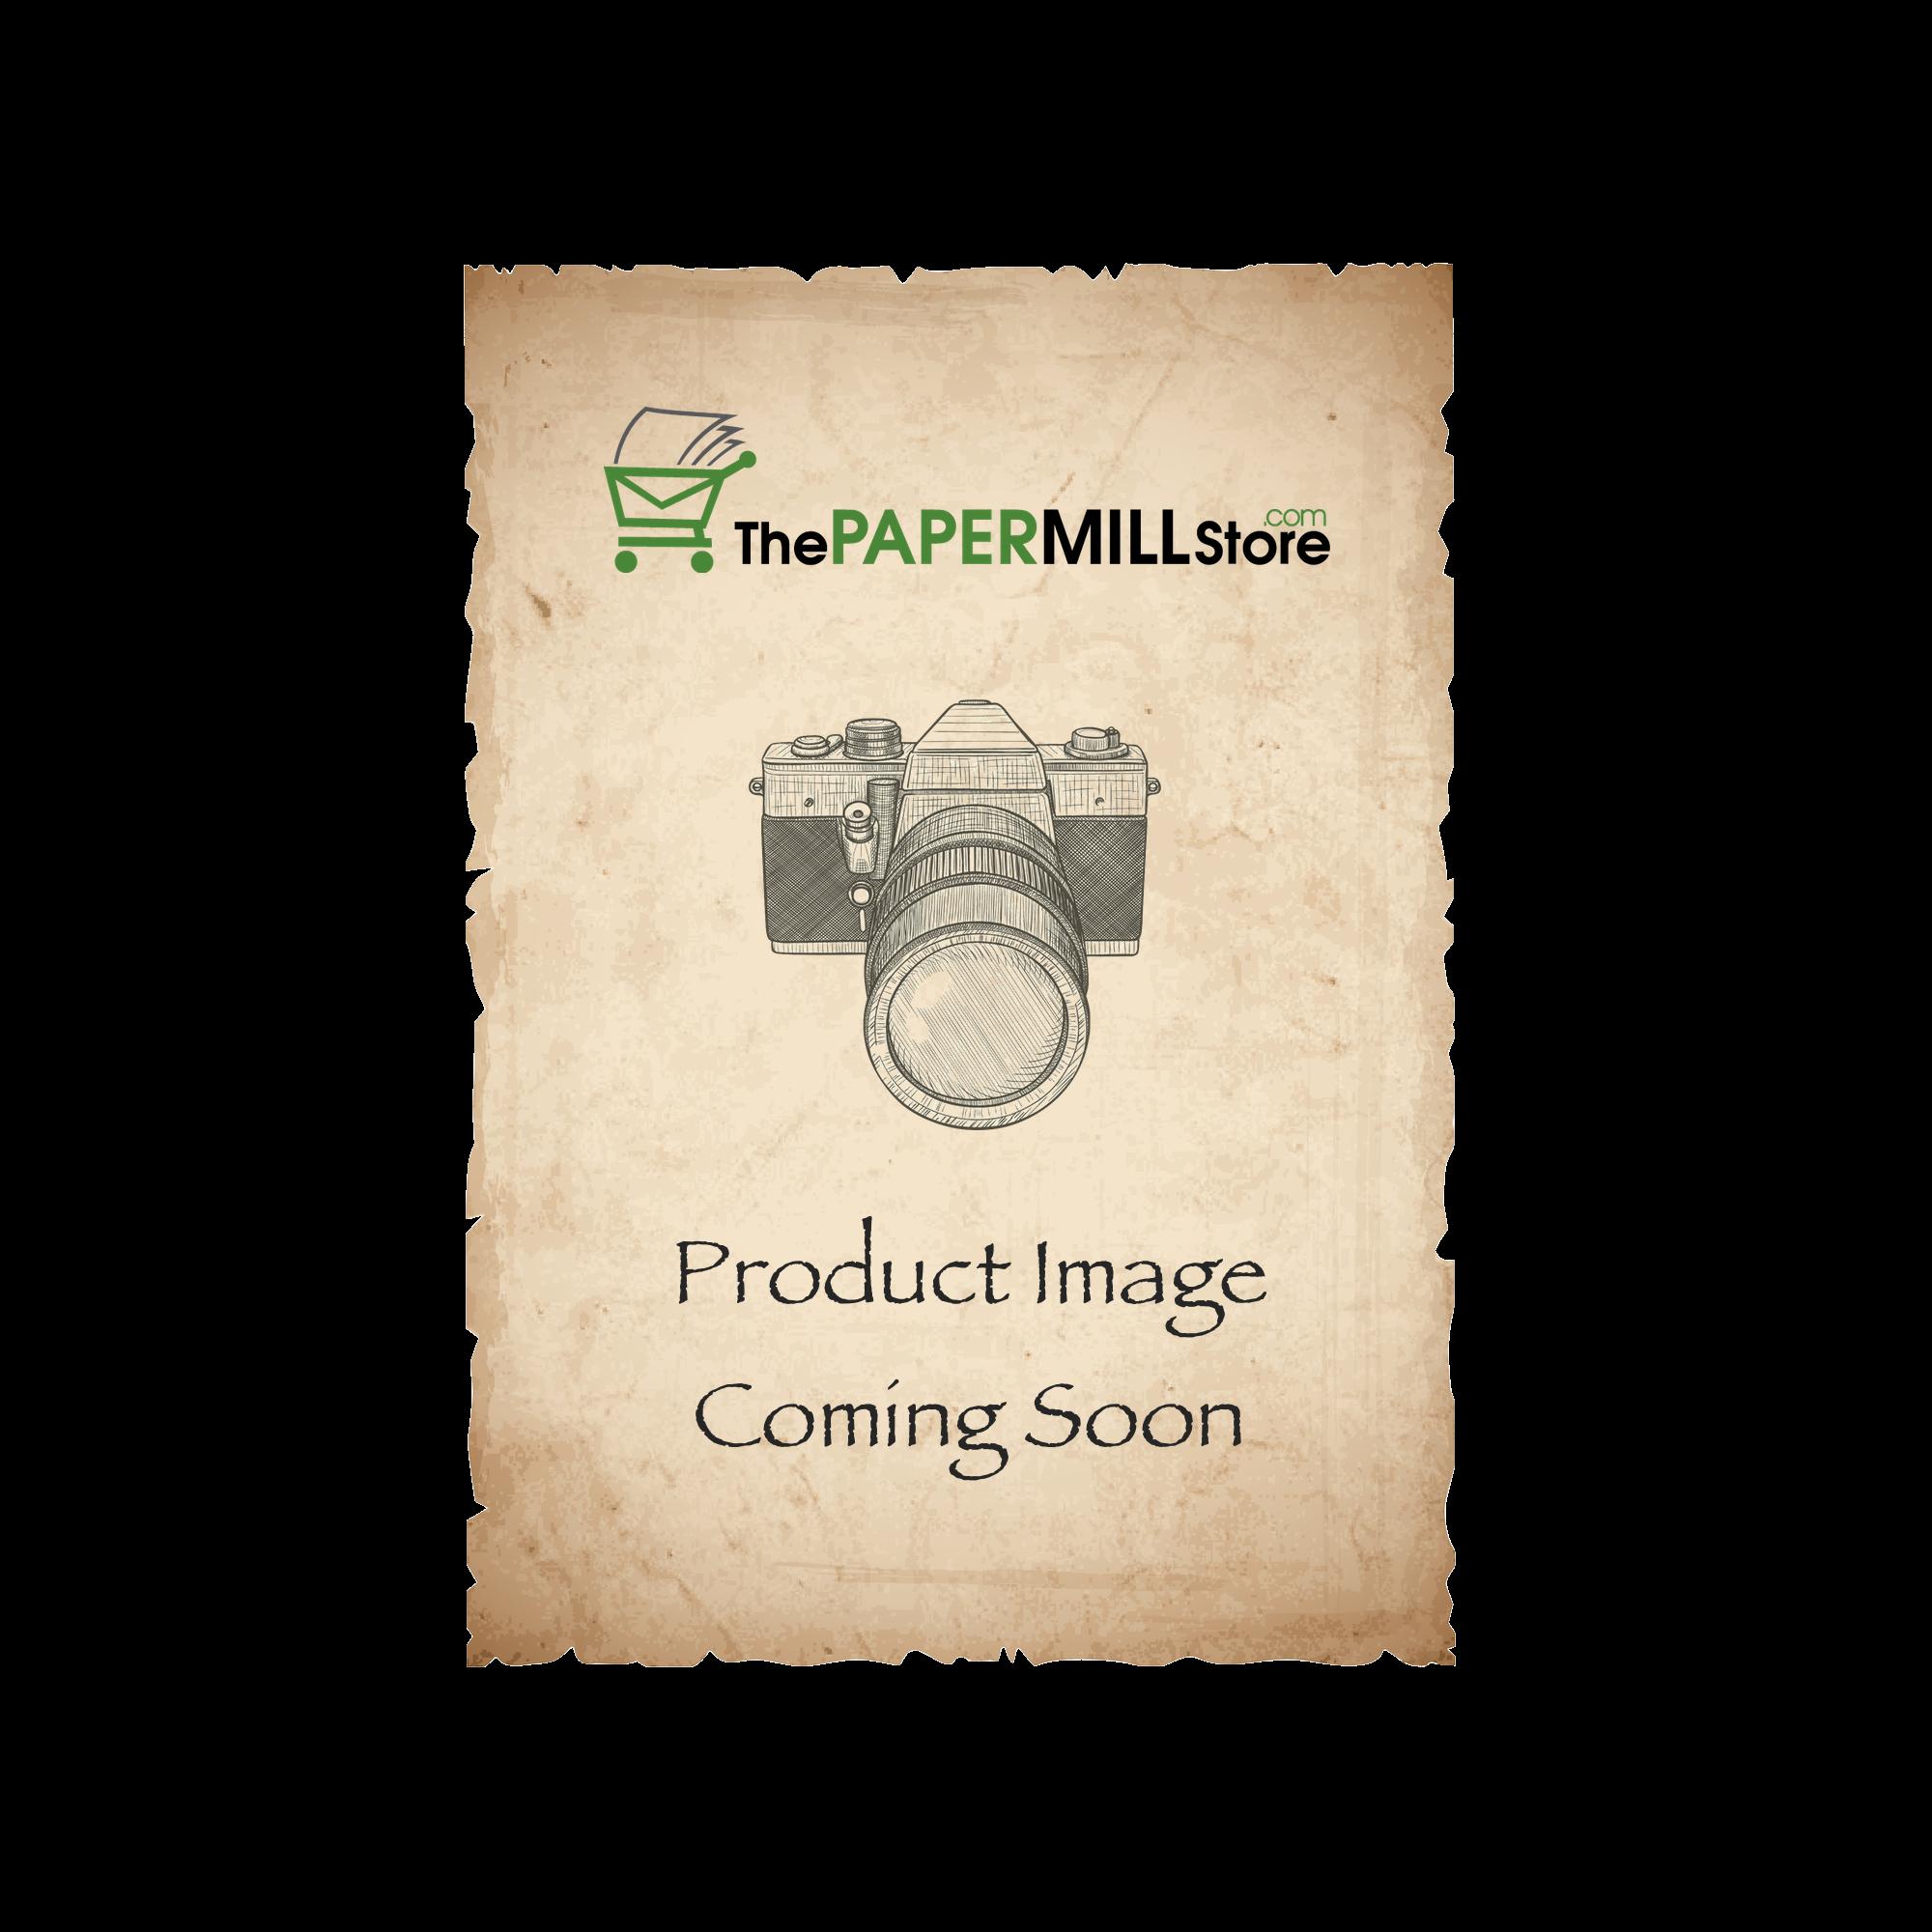 Loop Antique Vellum Milkweed Envelopes - A2 (4 3/8 x 5 3/4) 80 lb Text Antique Vellum  100% Recycled 250 per Box